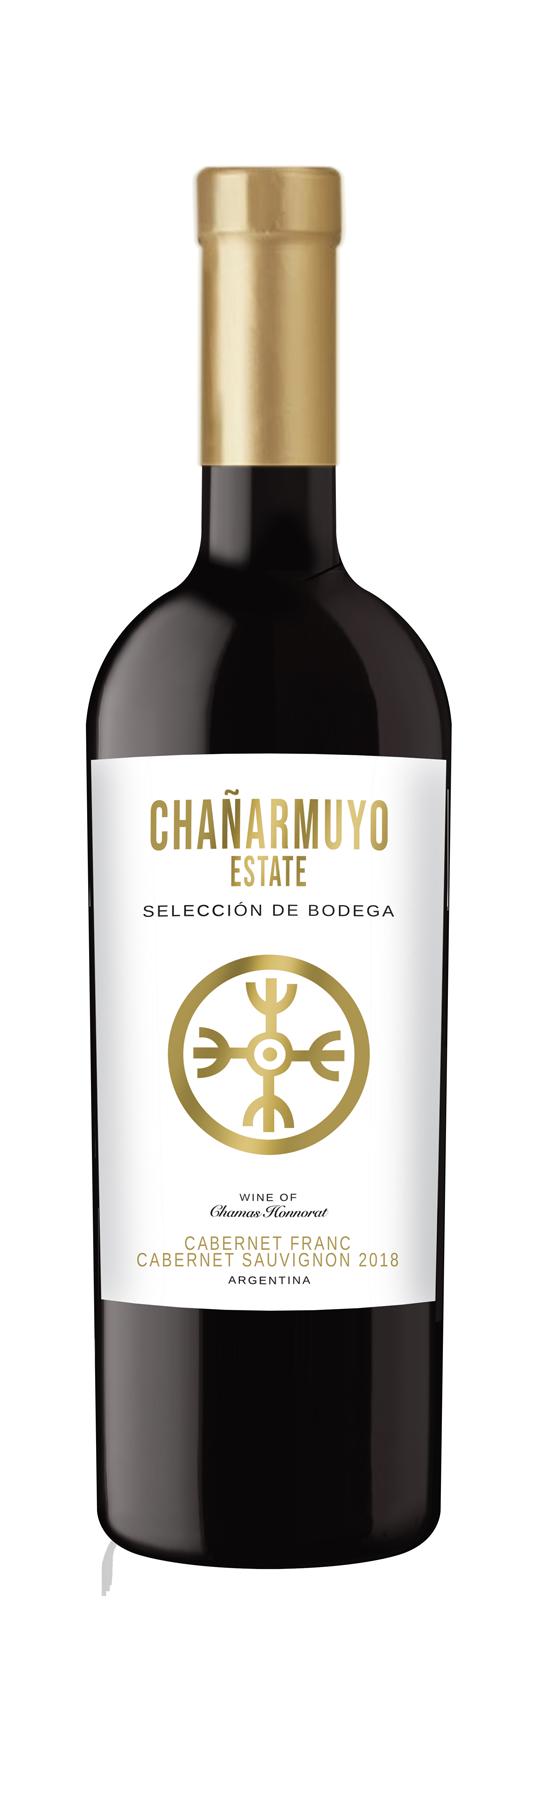 Chañarmuyo Cabernet Sauvignon / Franc 2014